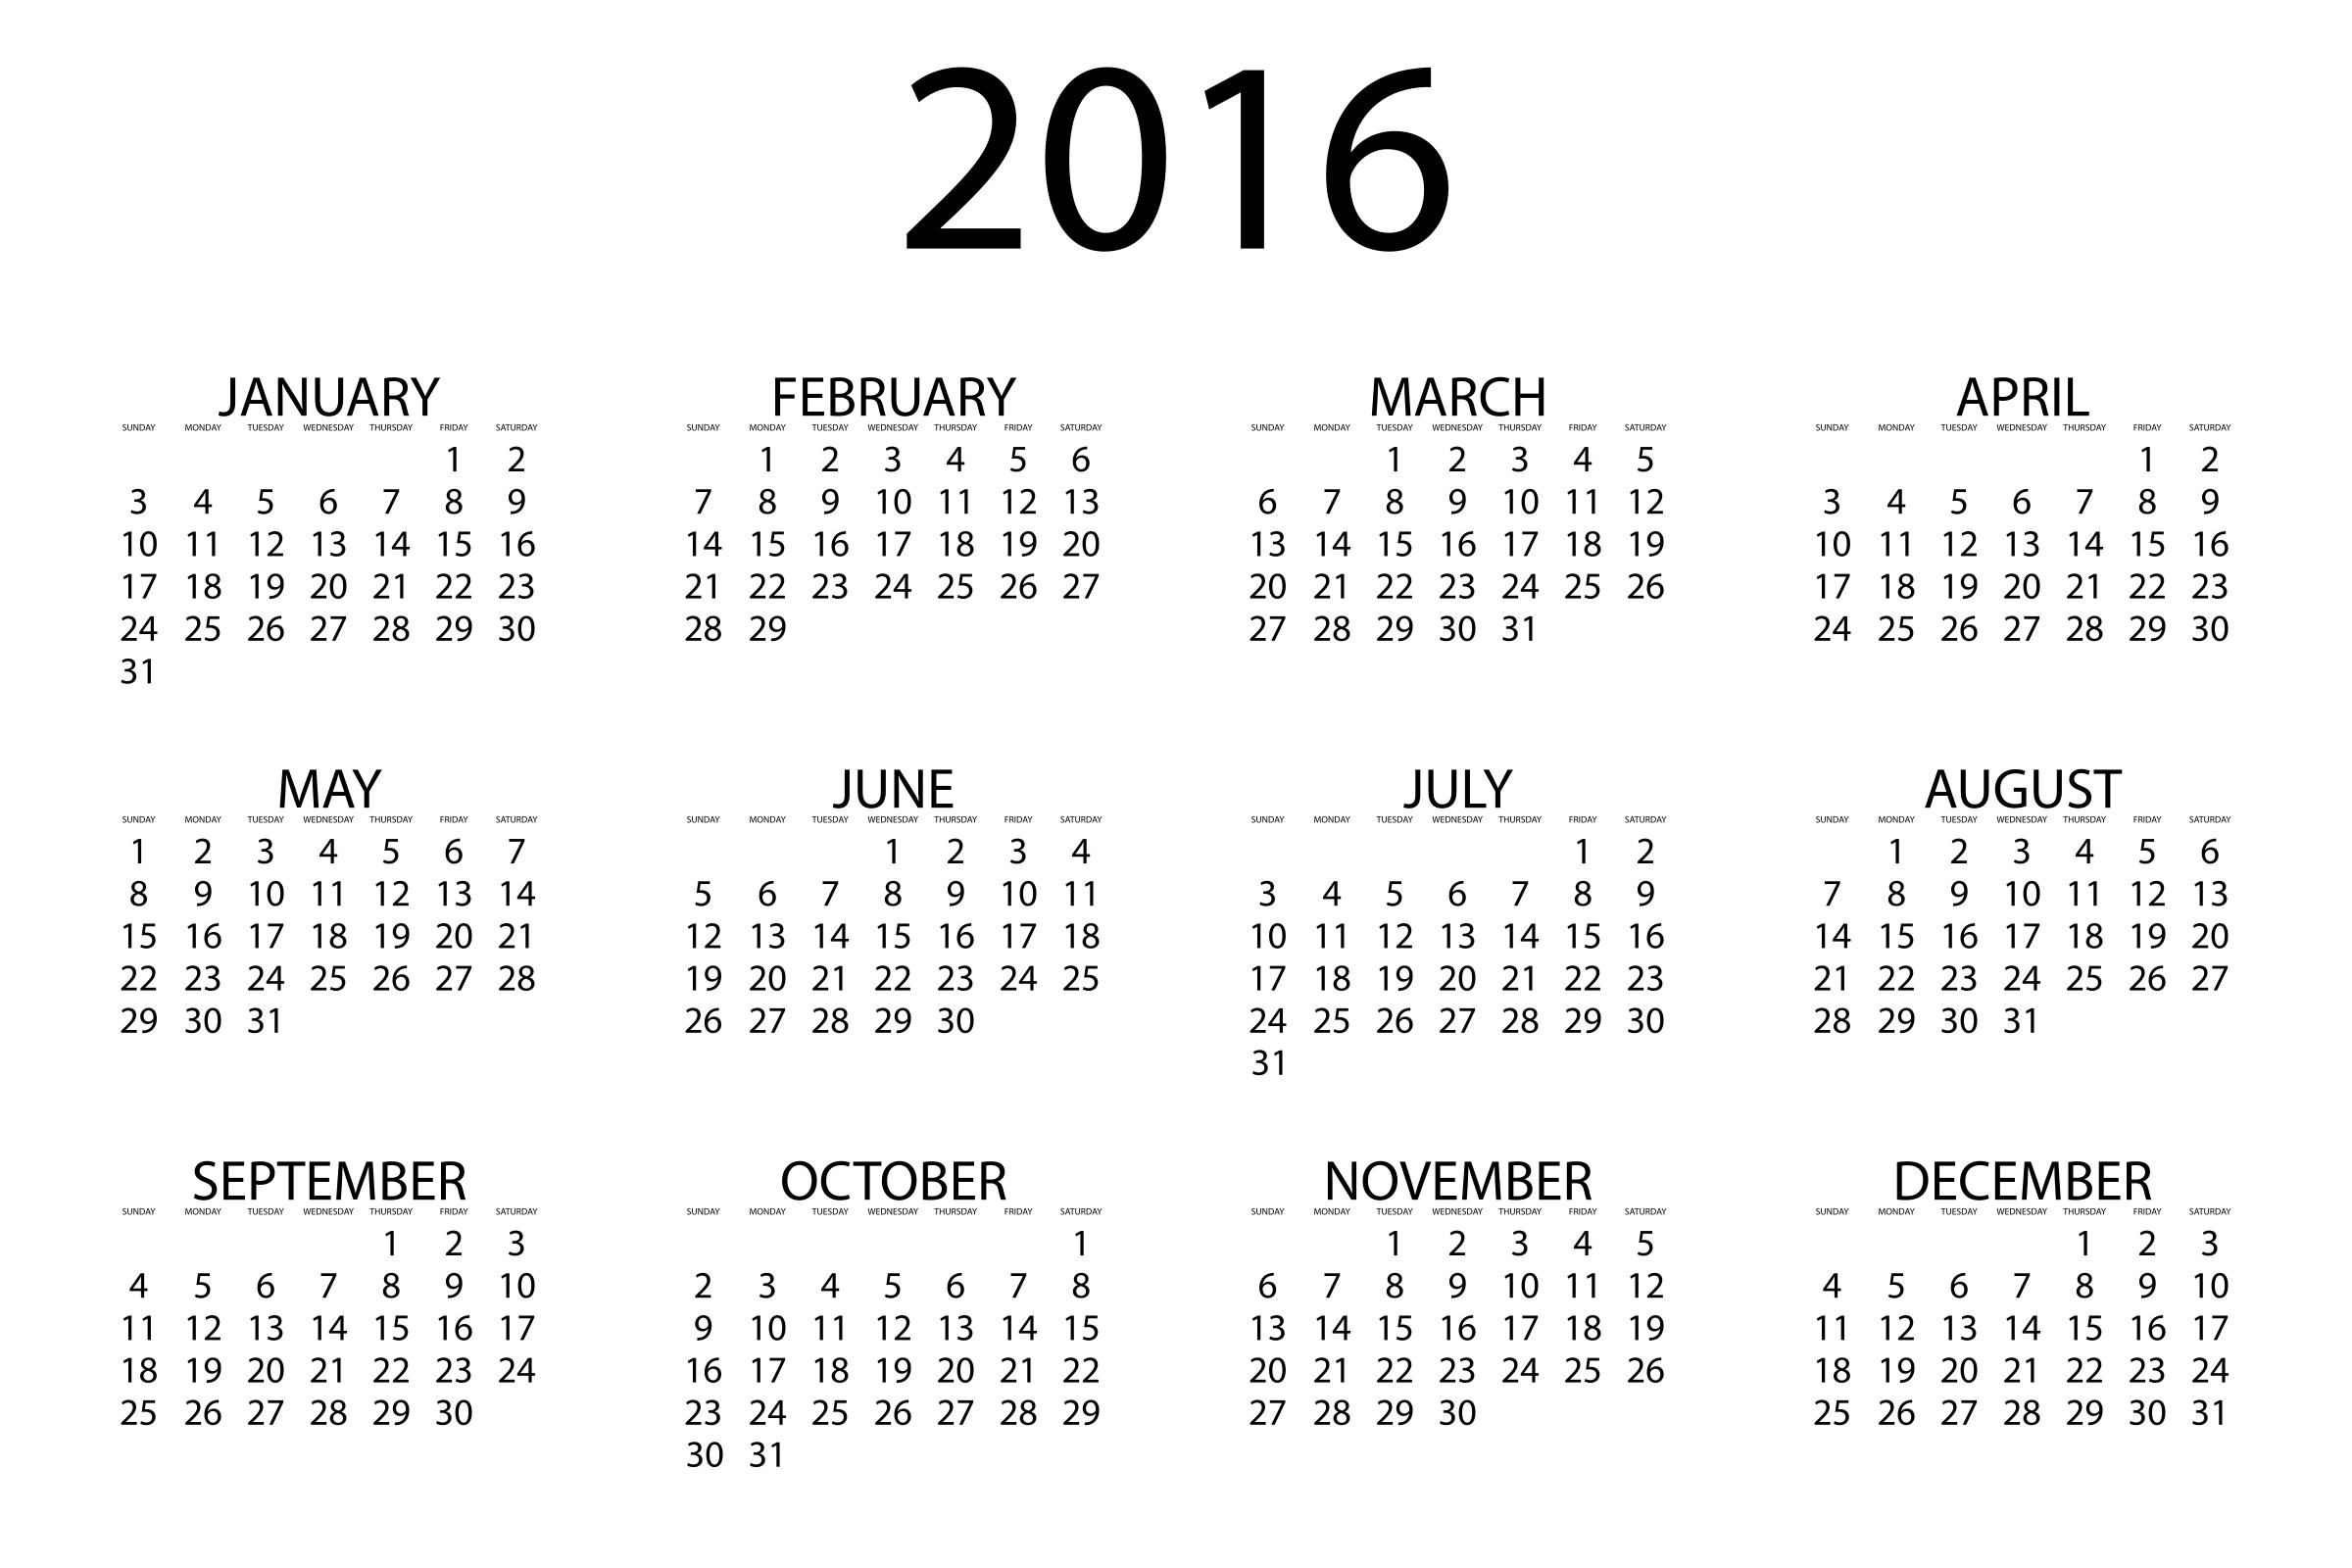 2016 Calendar by GDJ